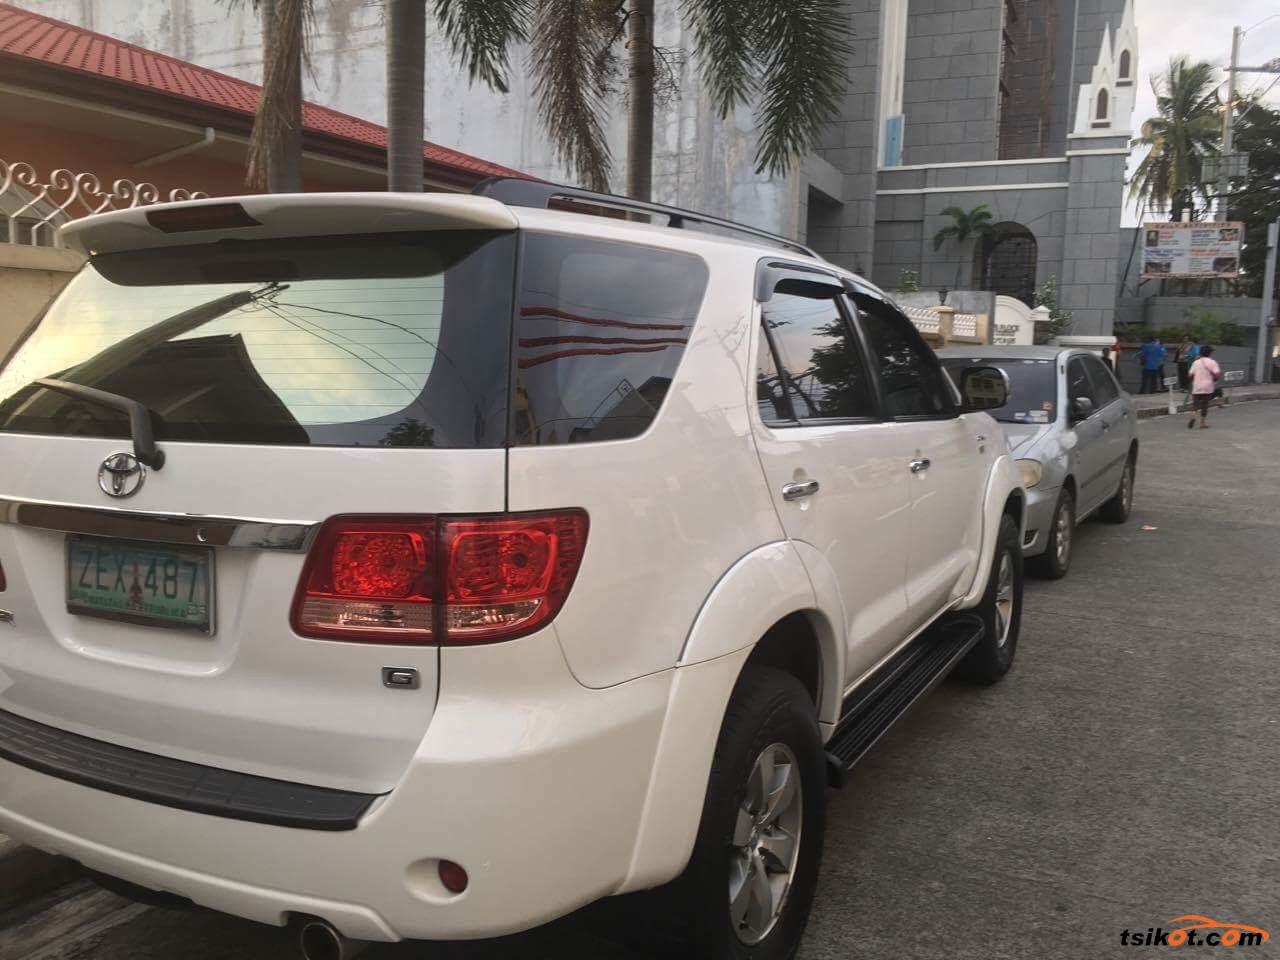 Yokohama Tires Price Philippines >> Toyota Fortuner 2006 - Car for Sale Metro Manila